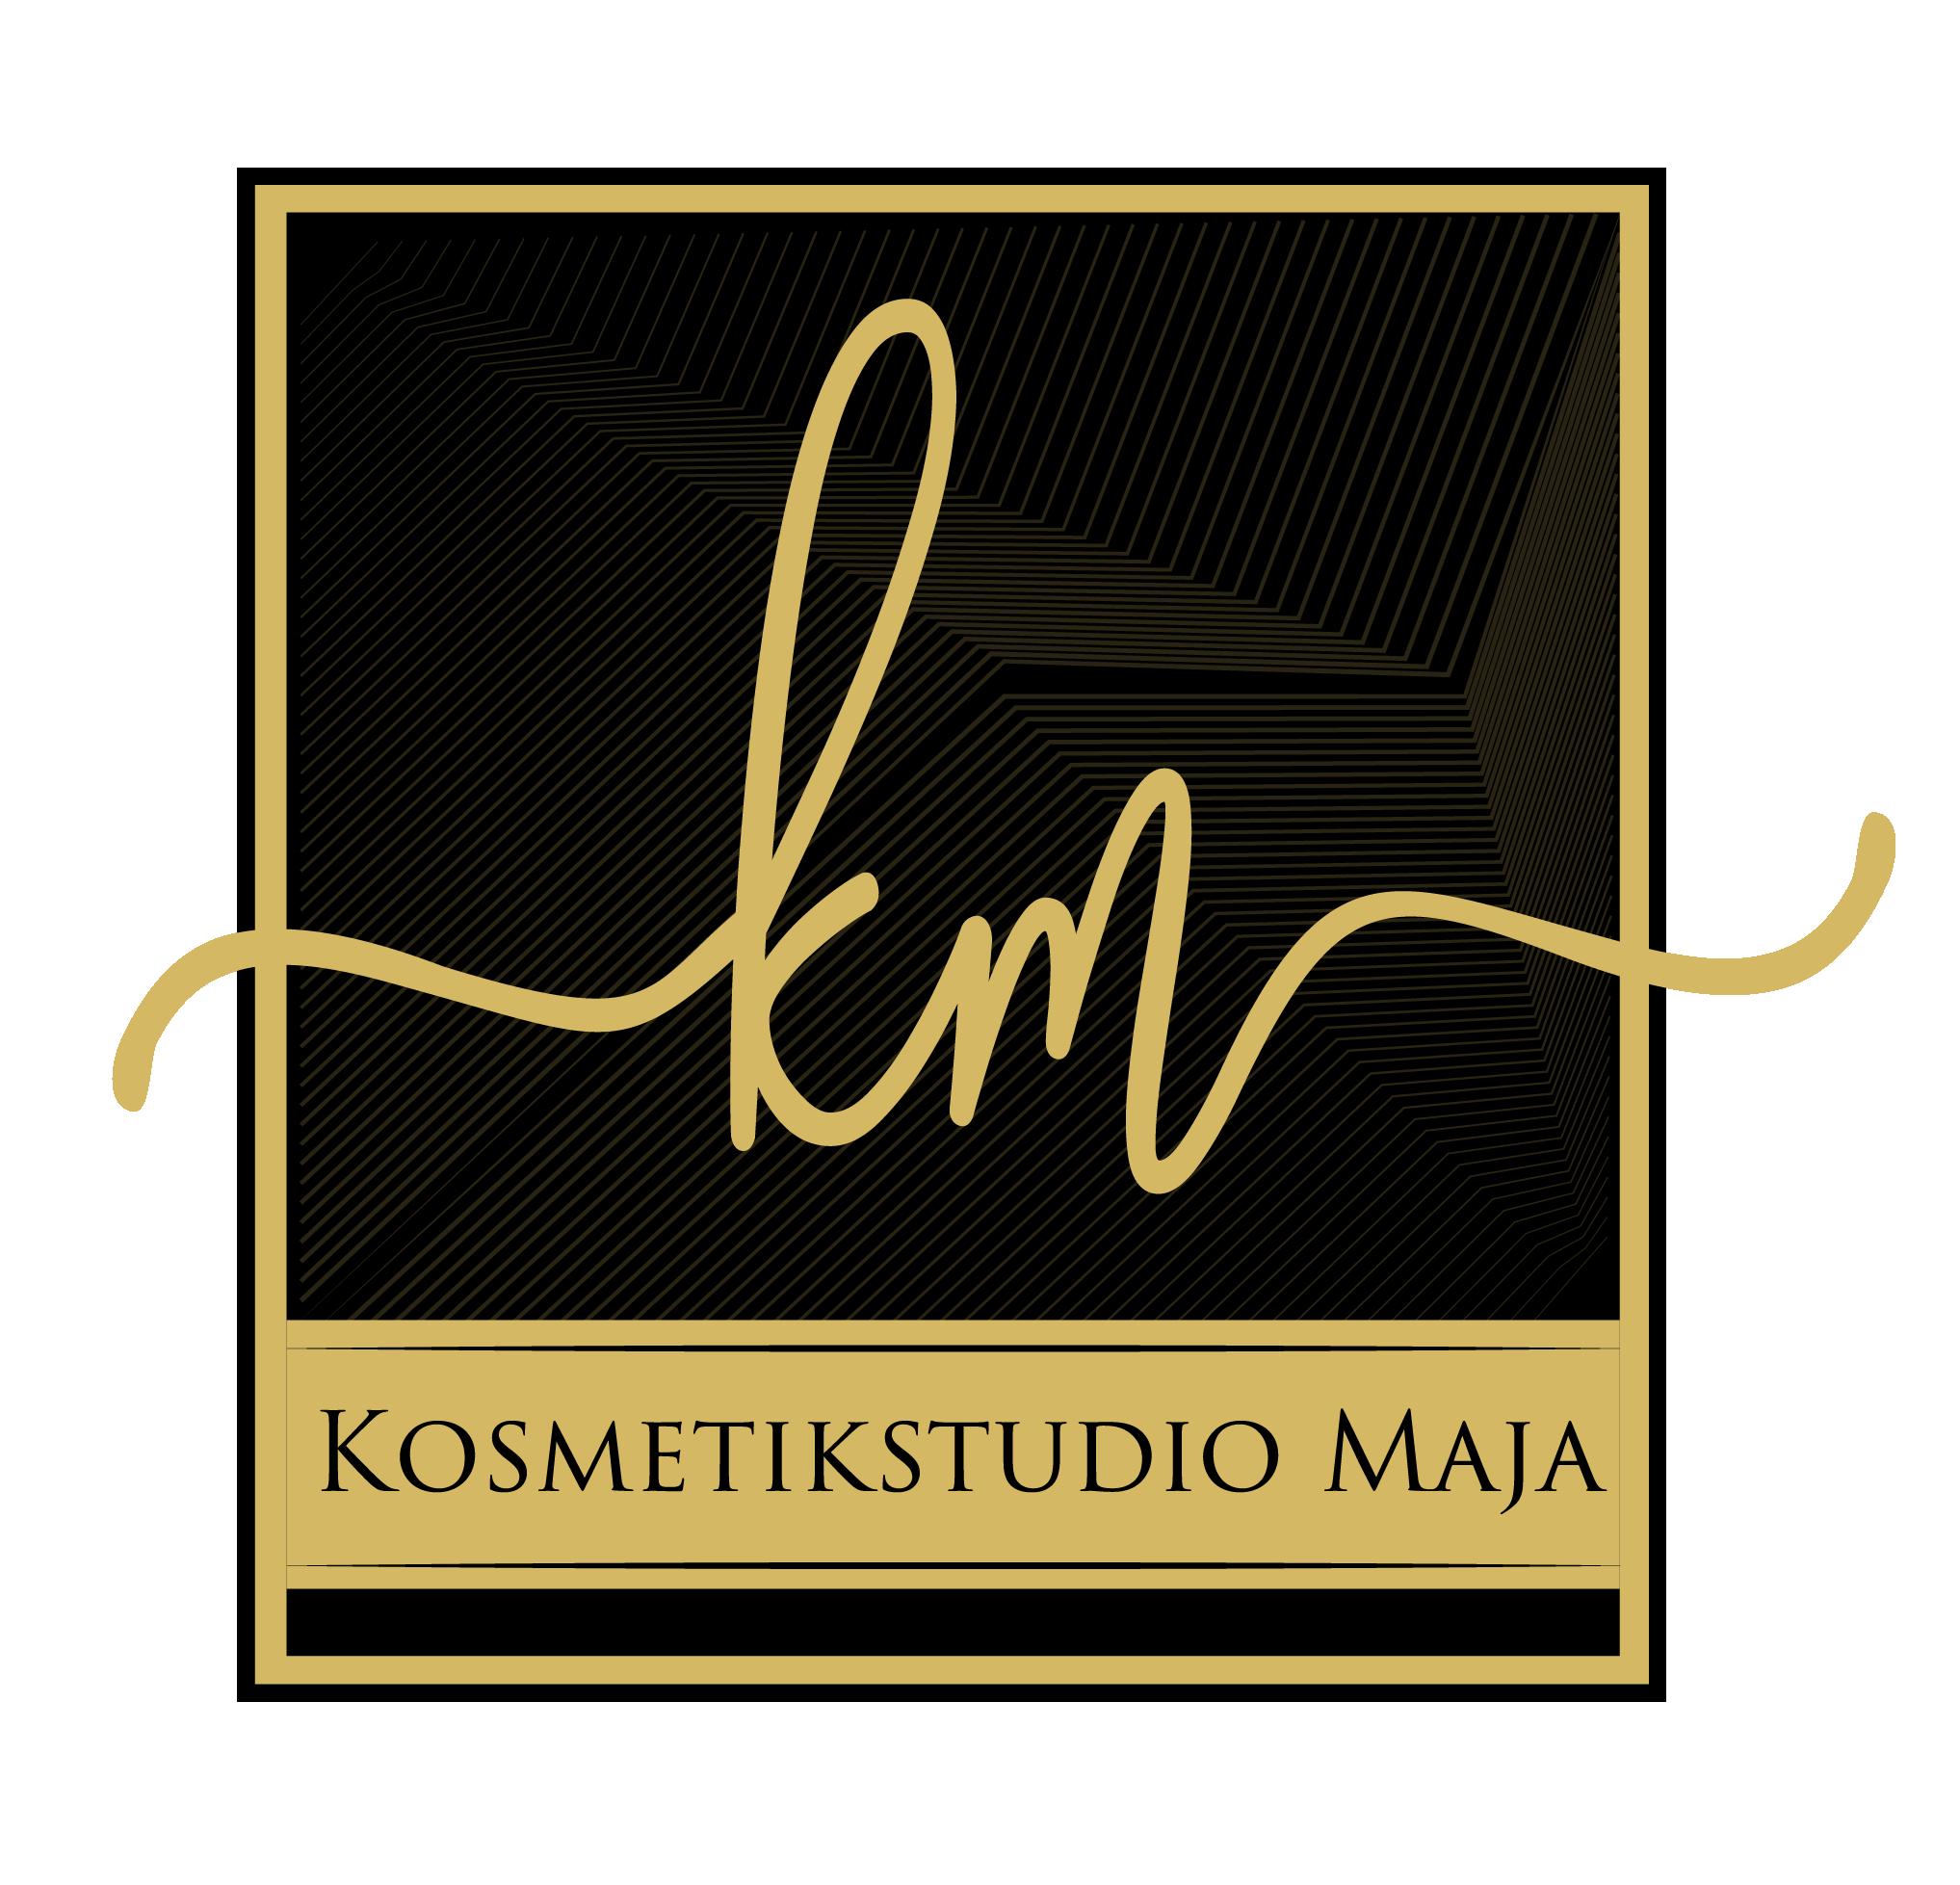 Kosmetikstudio Maja